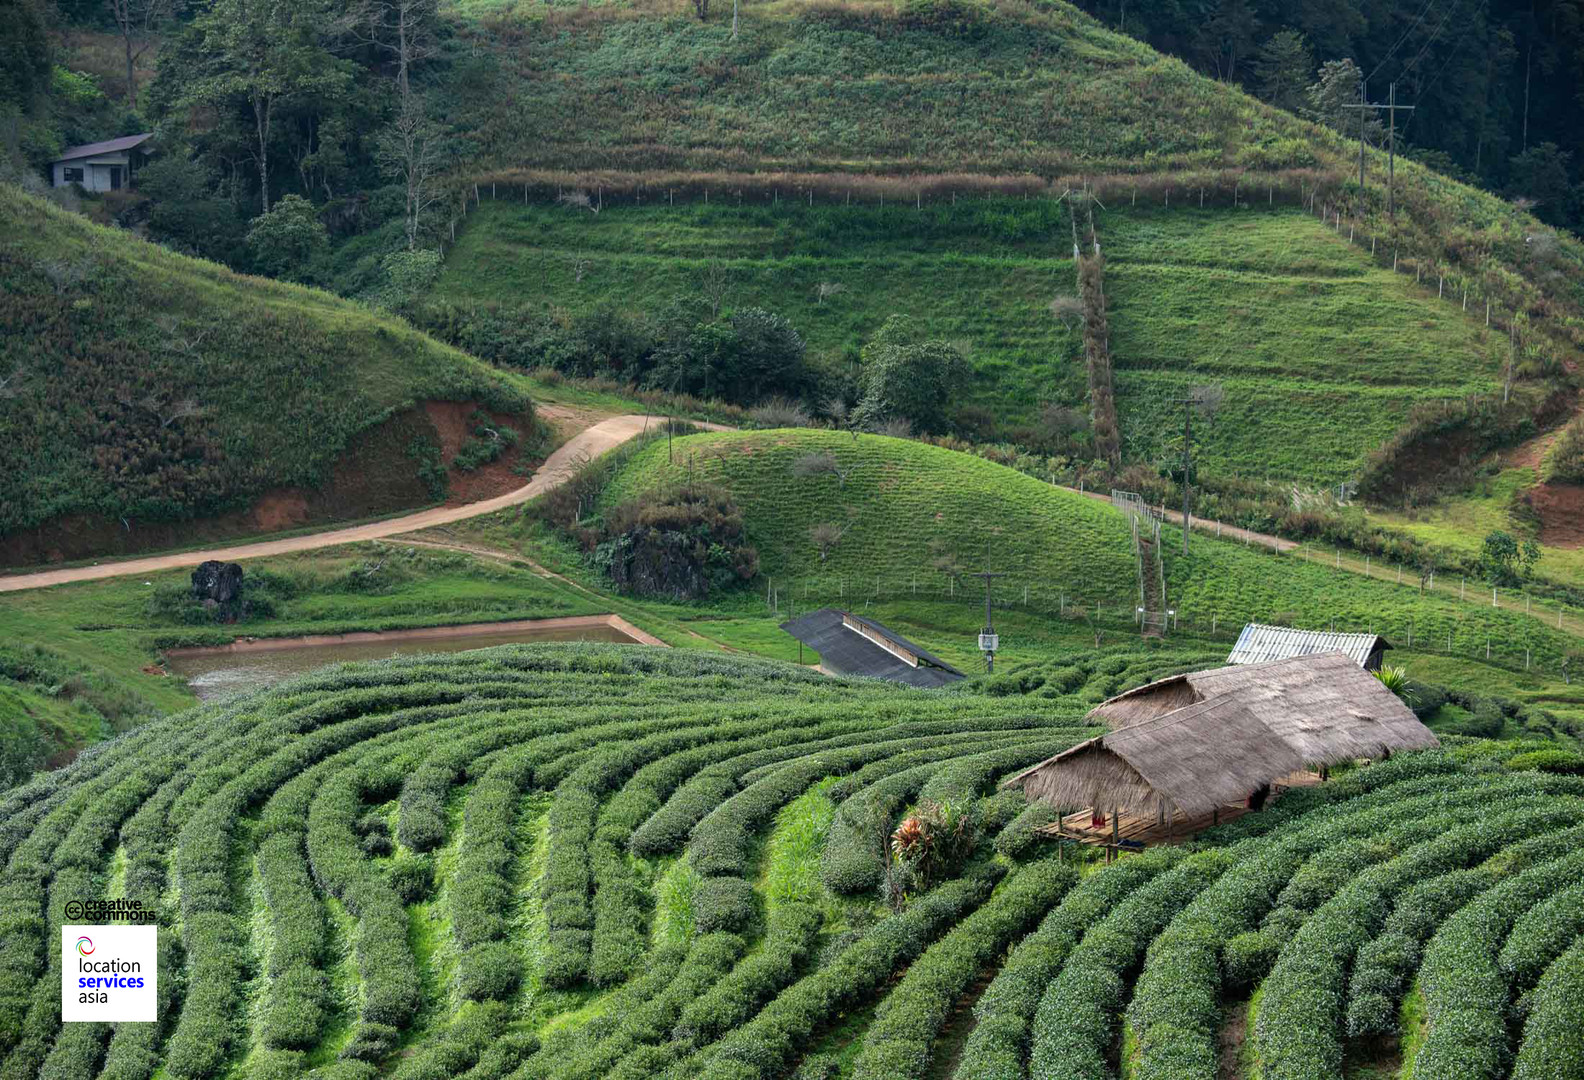 thai film locations farms fields k.jpg